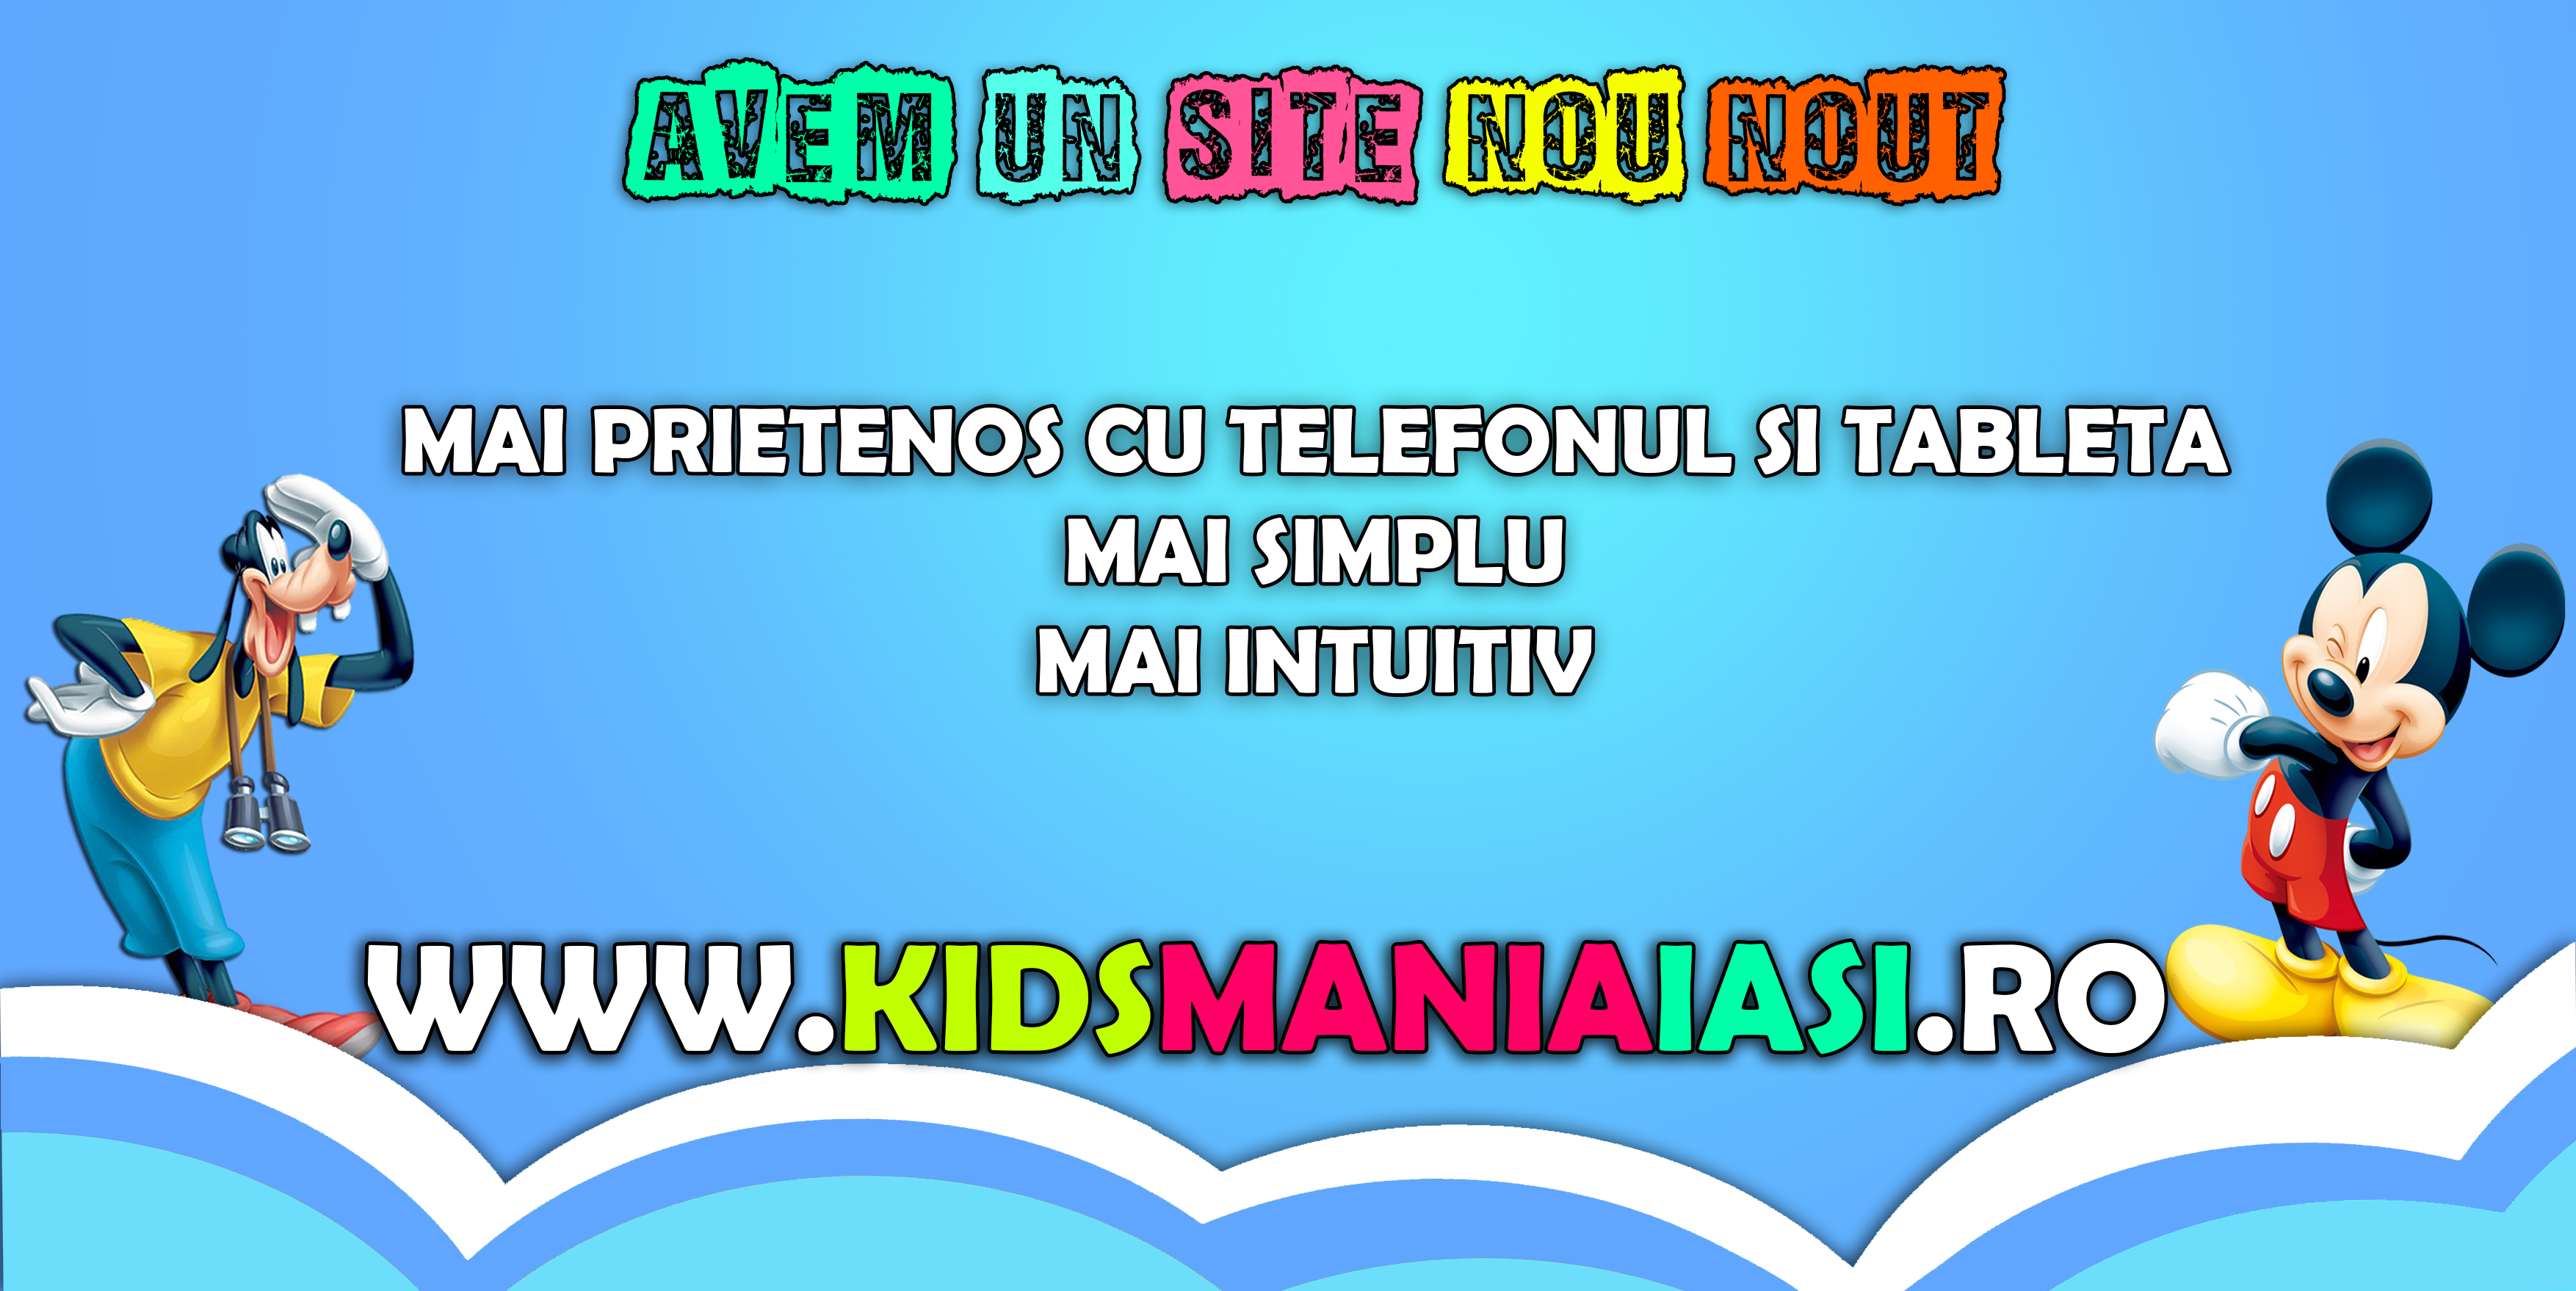 kids mania iasi - petreceri pentru copii, ursitoare la botez, animatori, mascote disney